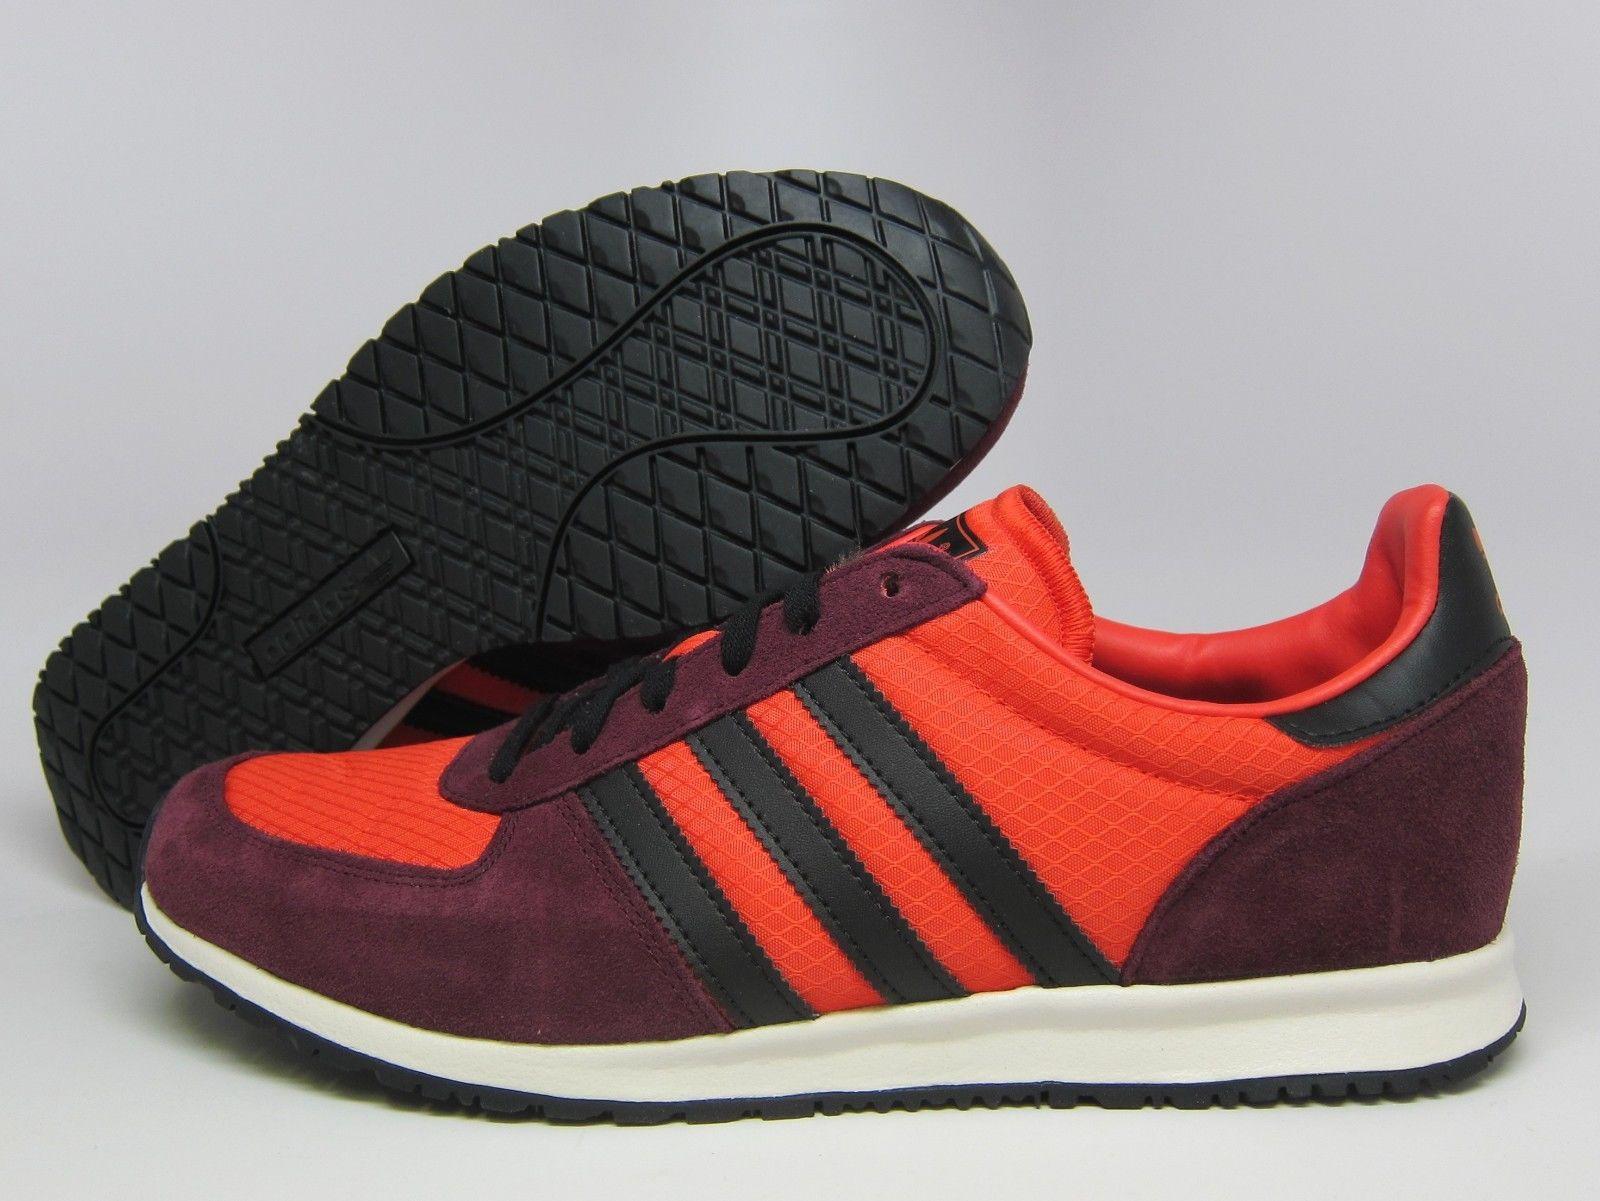 Adidas originals adistar racer uomo scarpa pelle sneaker for Adidas che cambiano colore